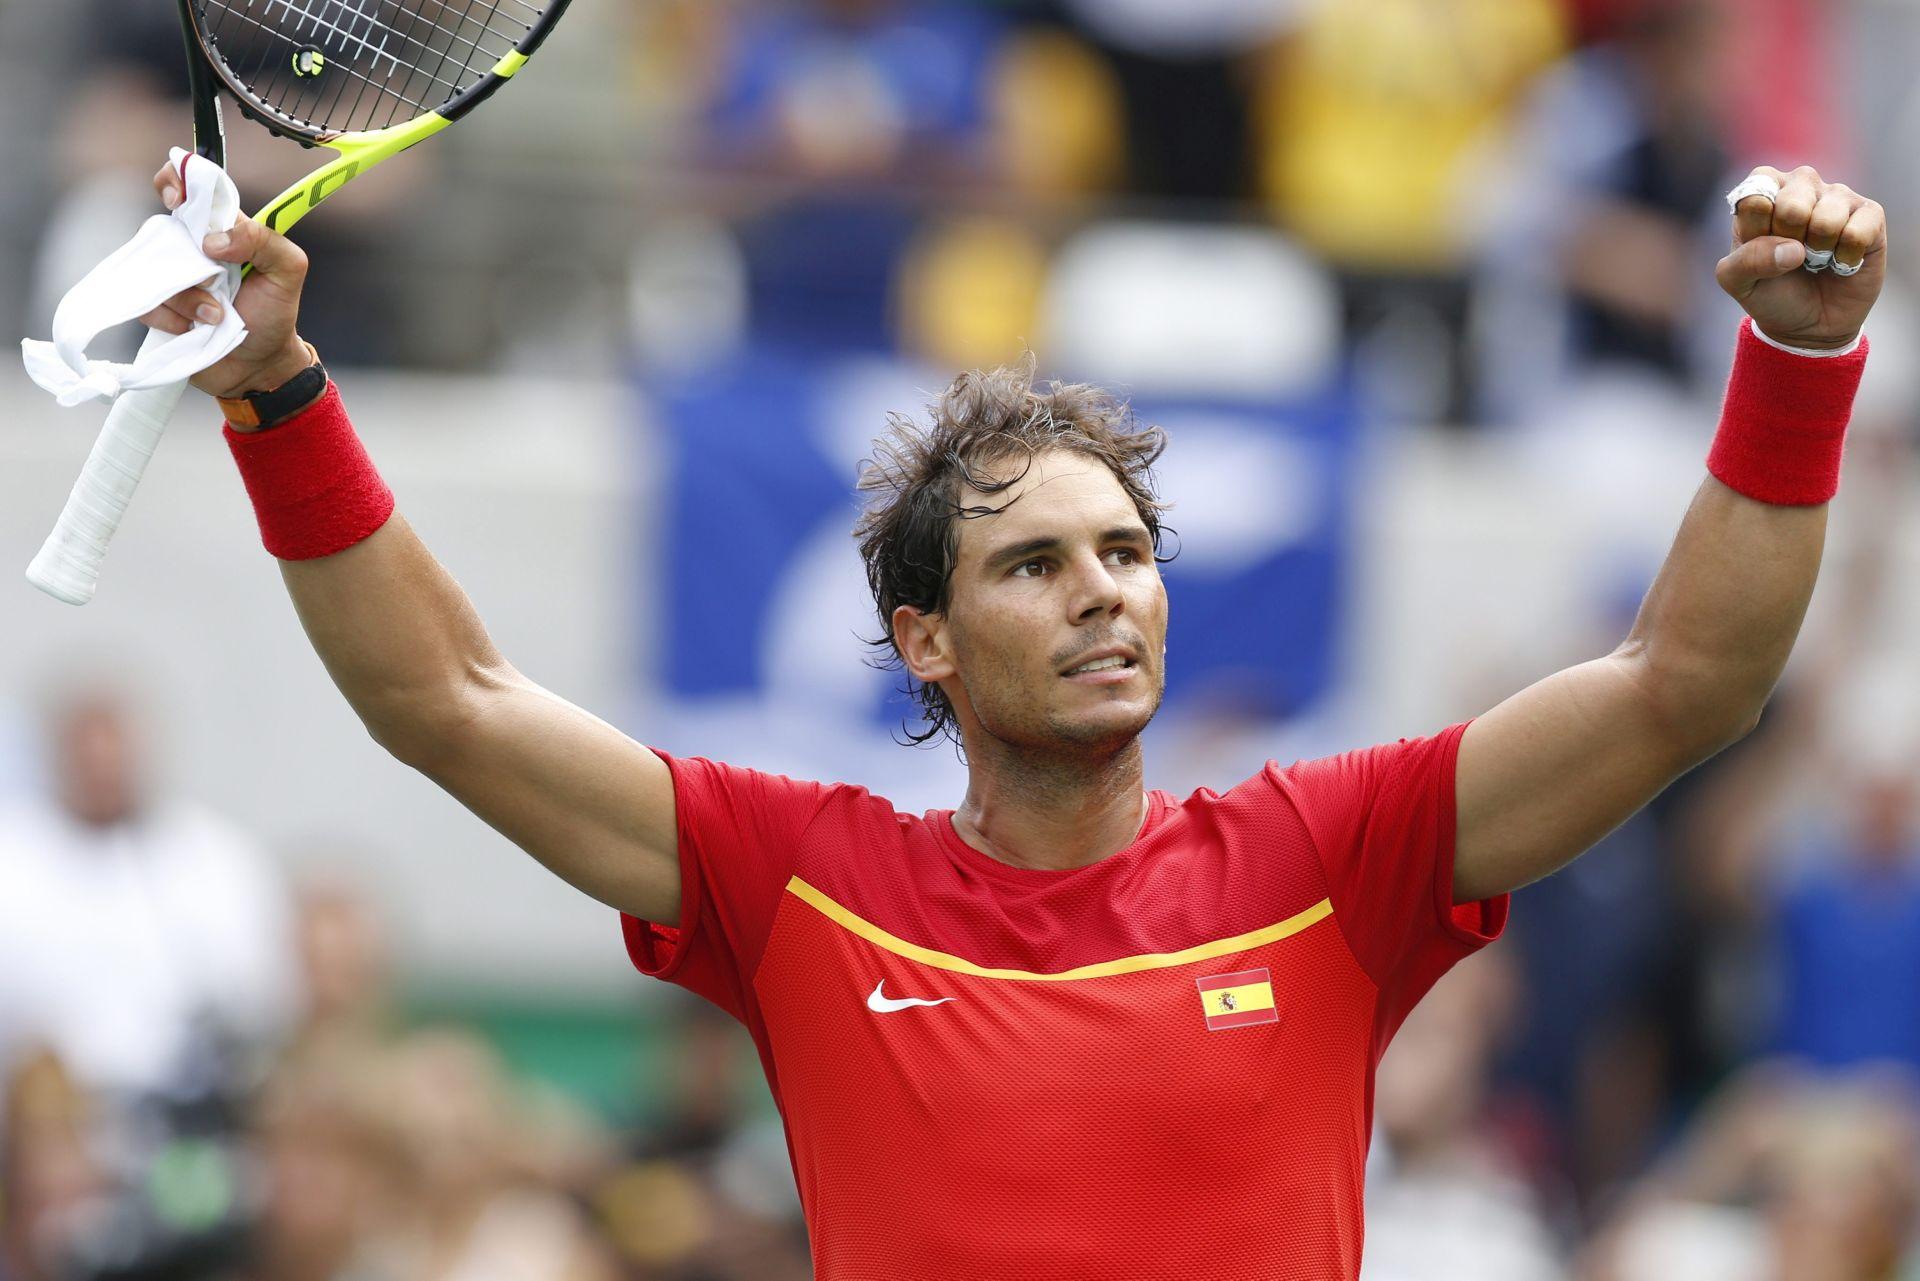 RAFAEL NADAL: 'Argentina je zemlja s teniskom tradicijom, žao mi je Hrvatske'